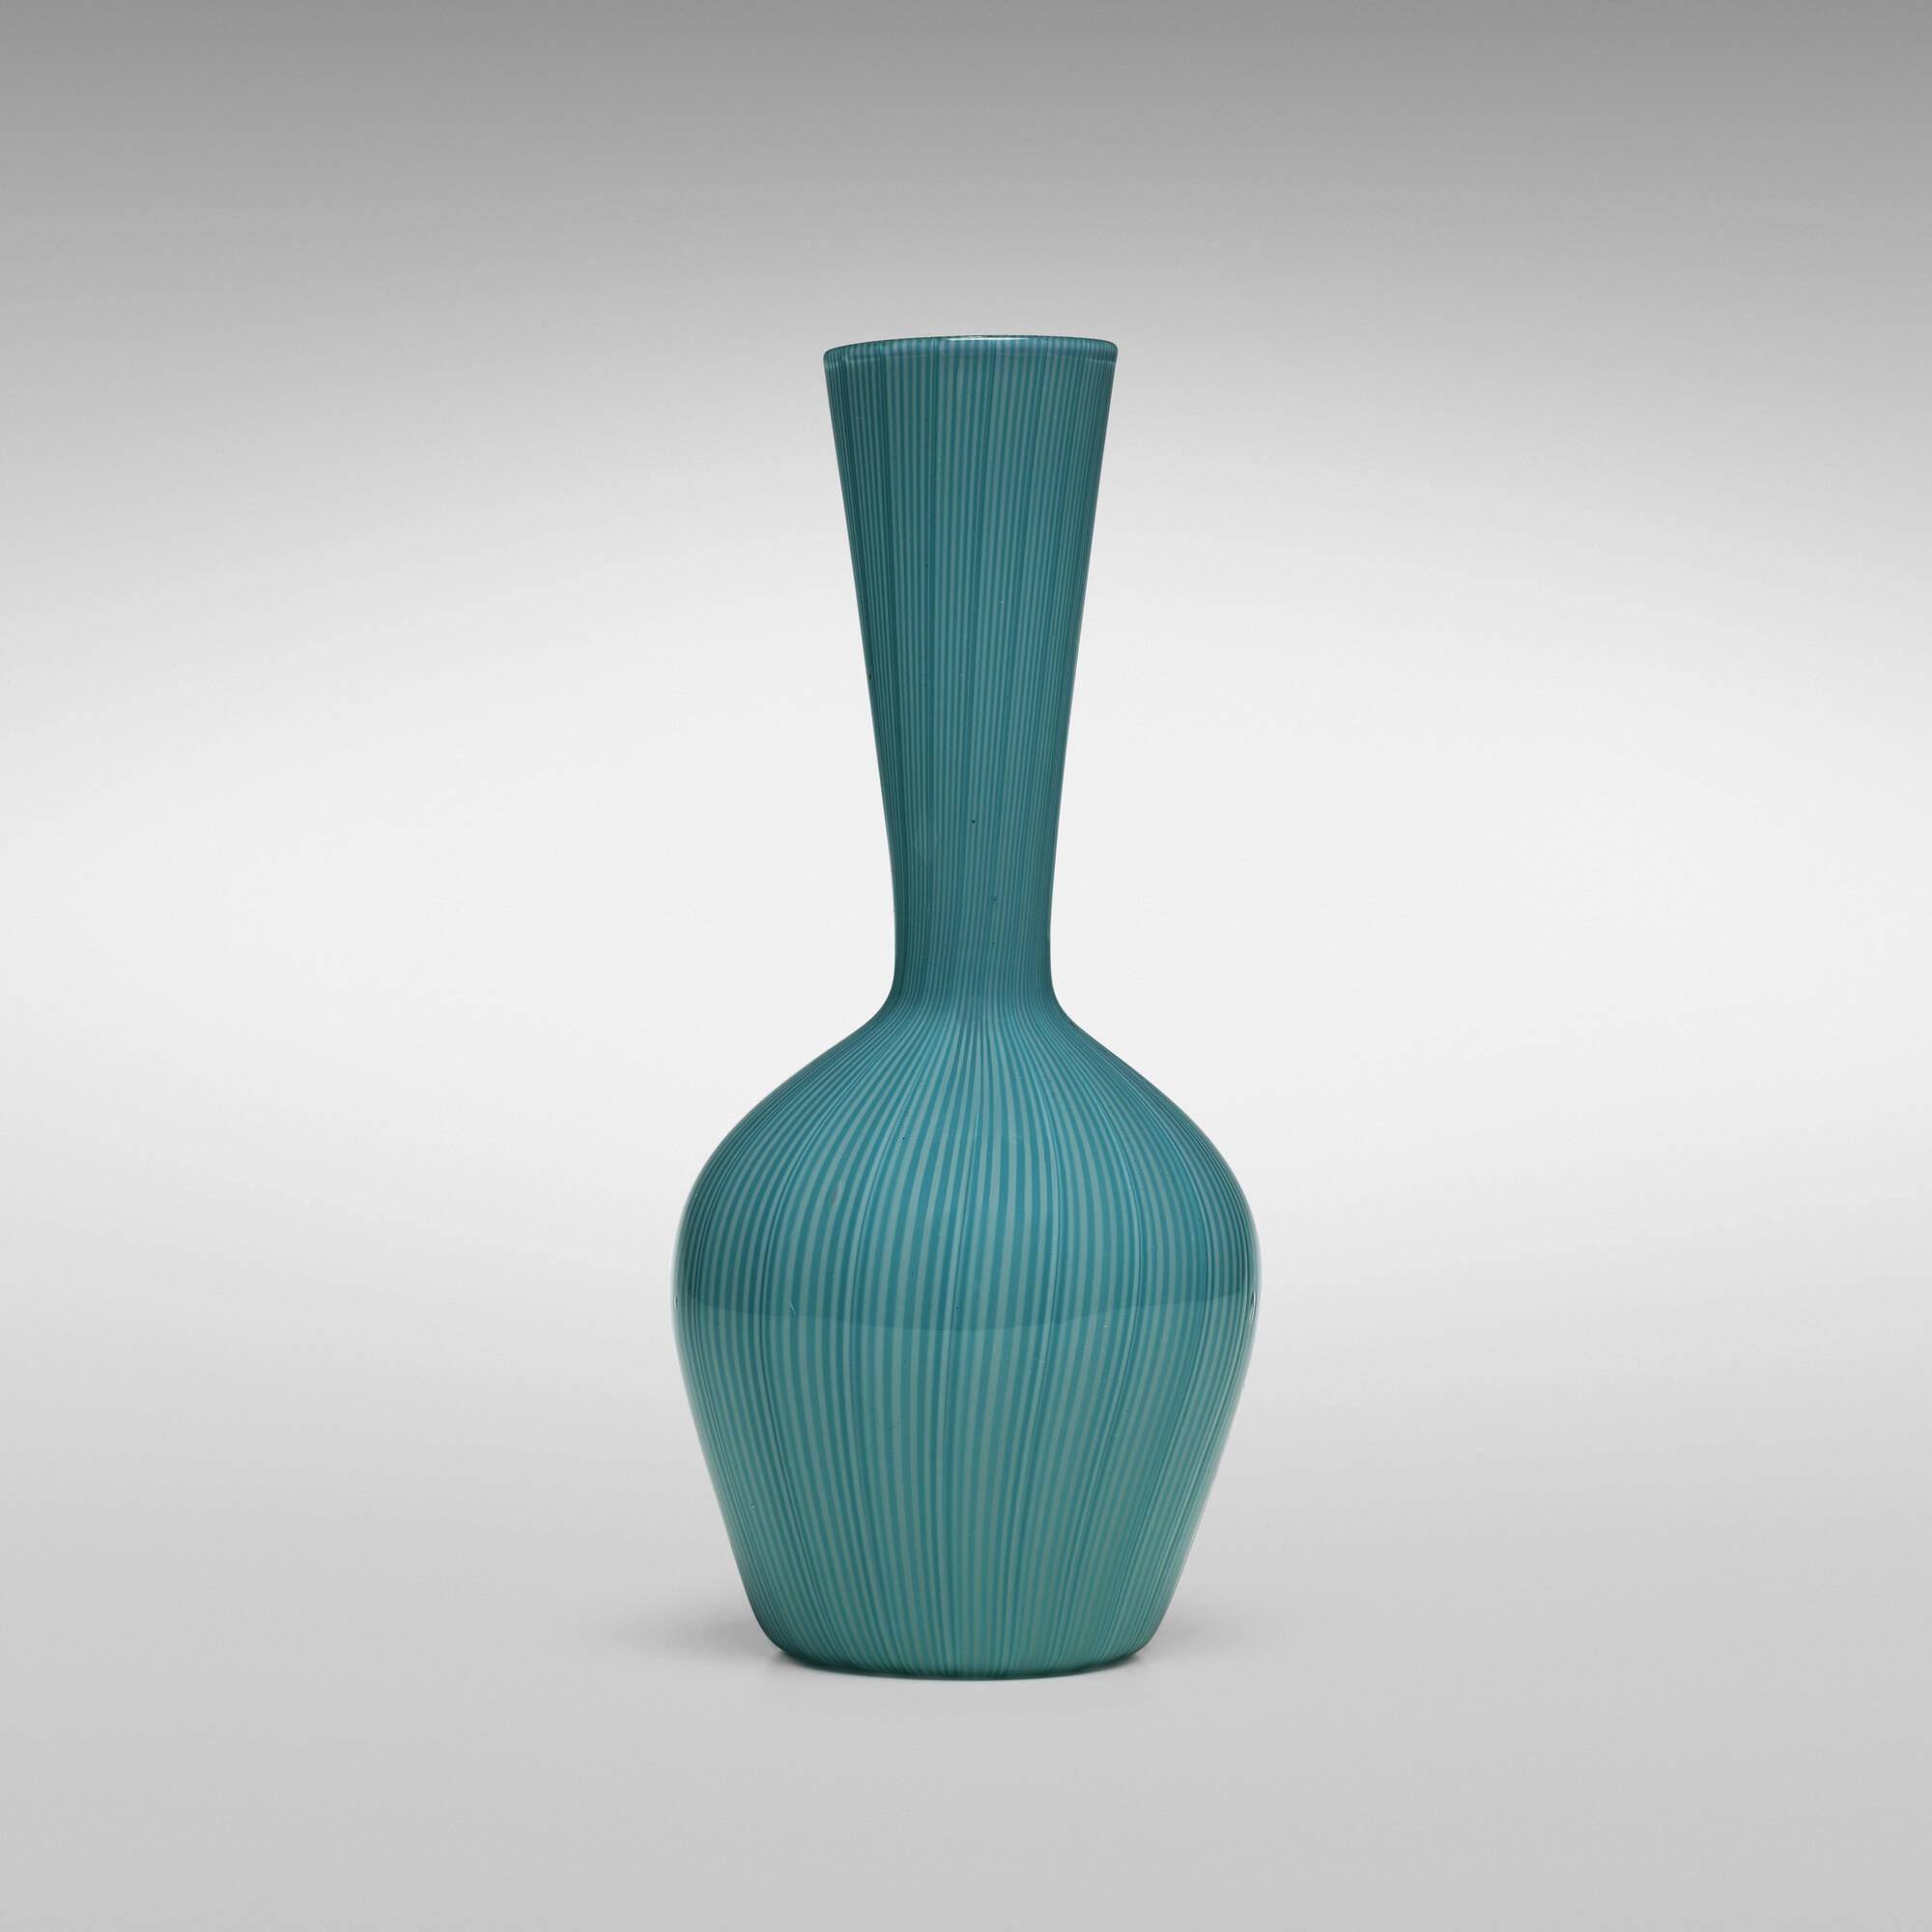 125 carlo scarpa tessuto vase model 3917 important italian 125 carlo scarpa tessuto vase model 3917 1 of 3 floridaeventfo Image collections